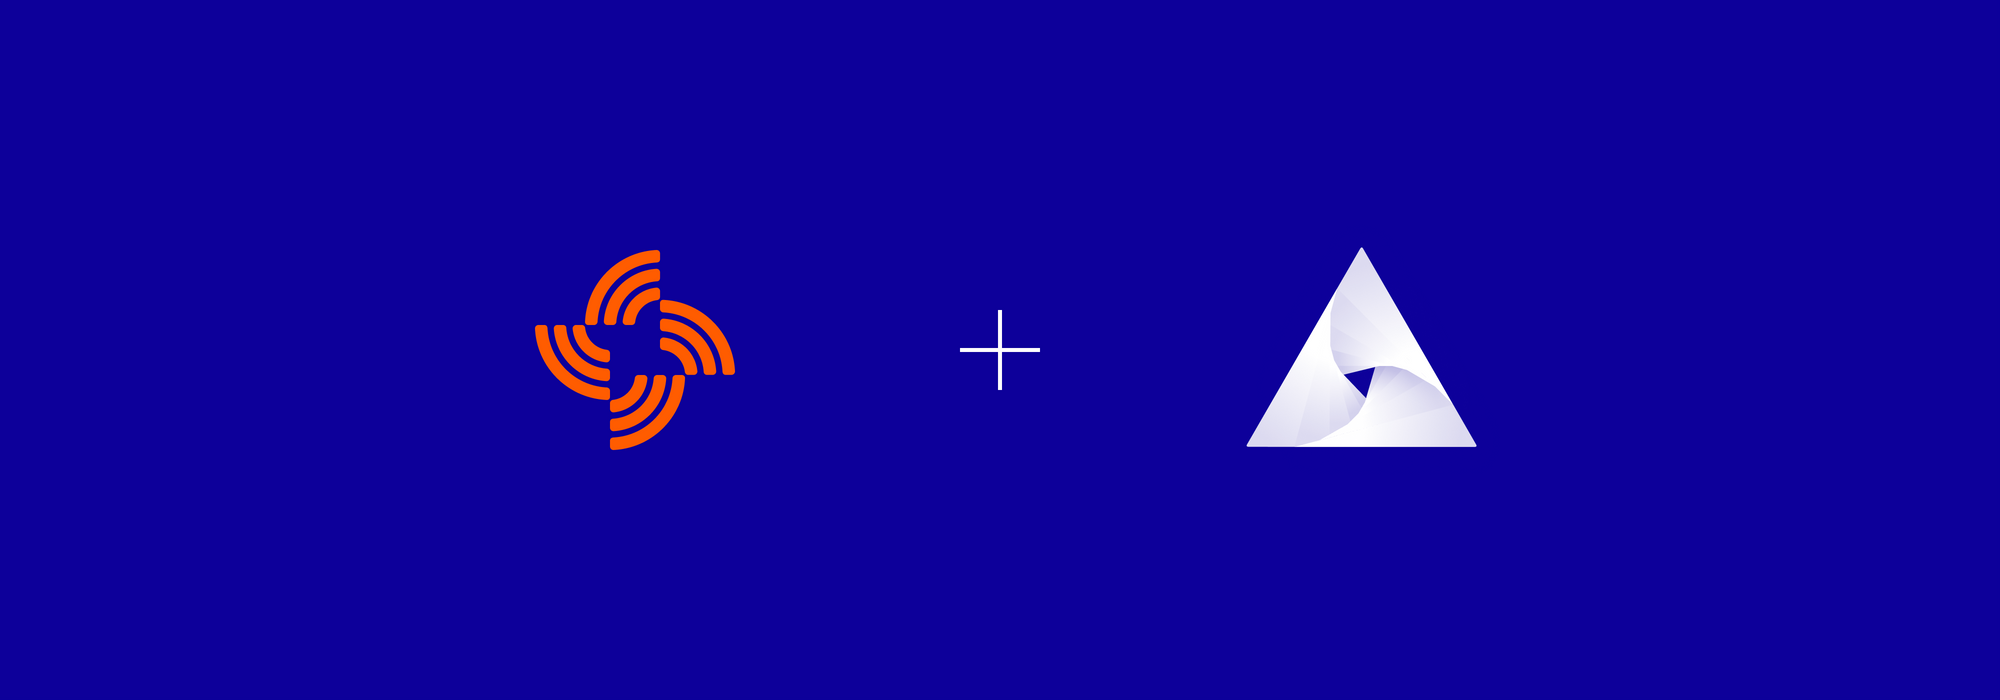 Streamr加入API3 DAO,成为创始治理合作伙伴